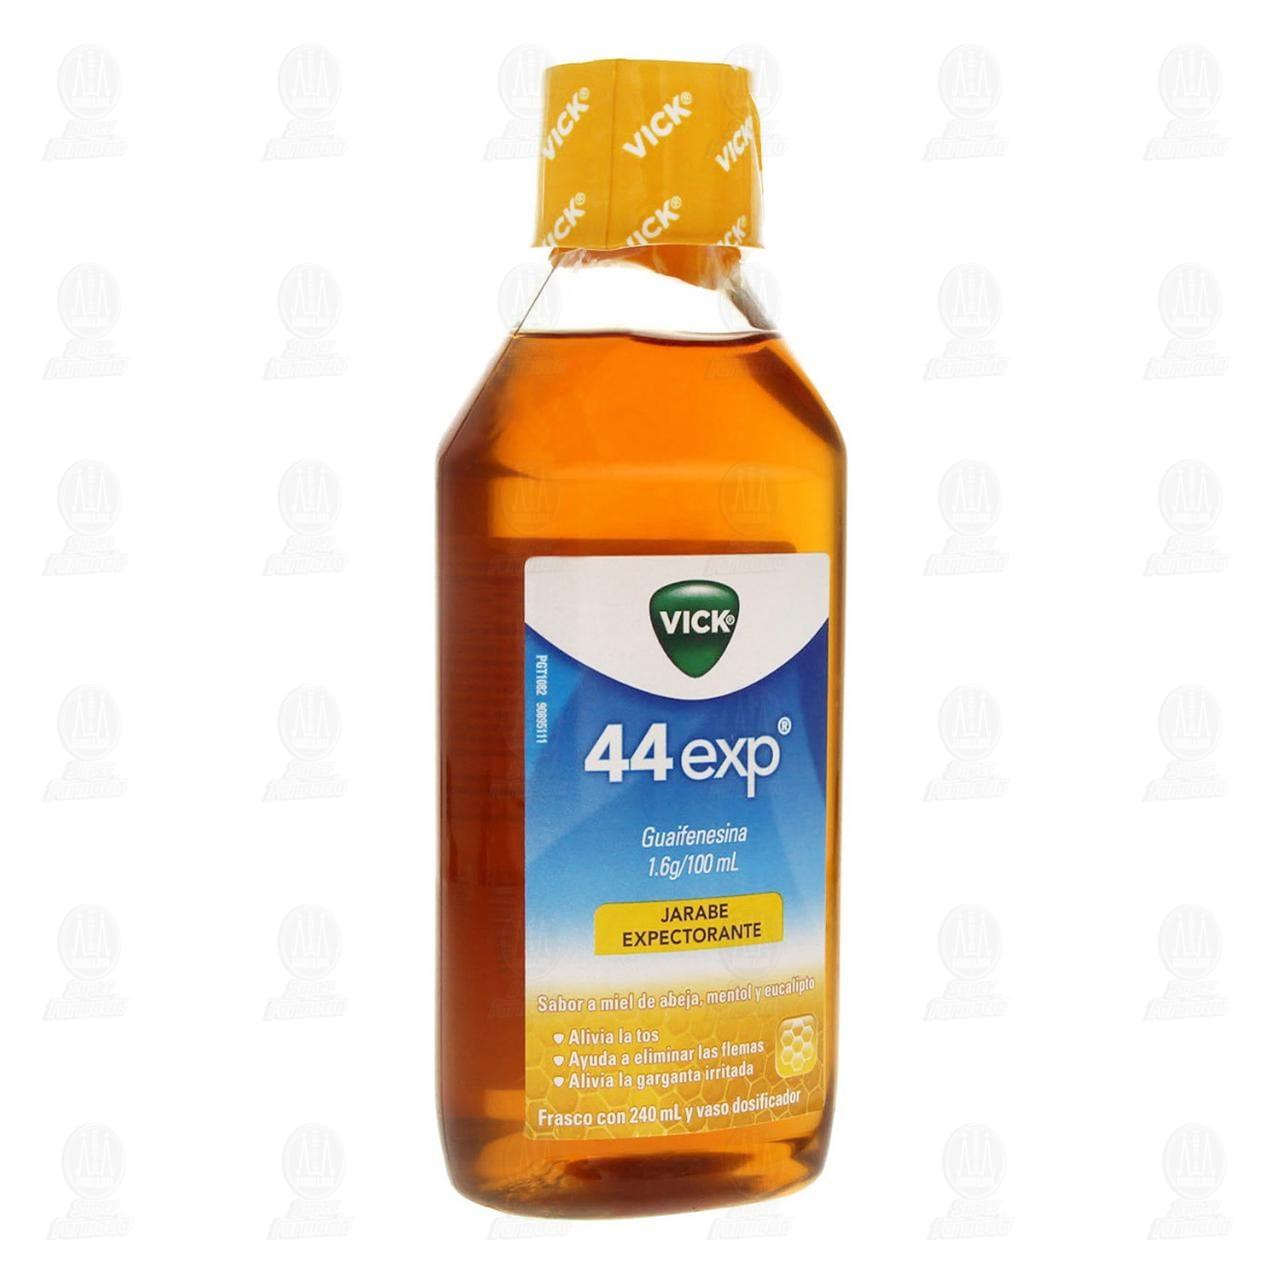 Comprar Vick 44 Exp Sabor a Miel de Abeja, Mentol y Eucalipto 240ml en Farmacias Guadalajara